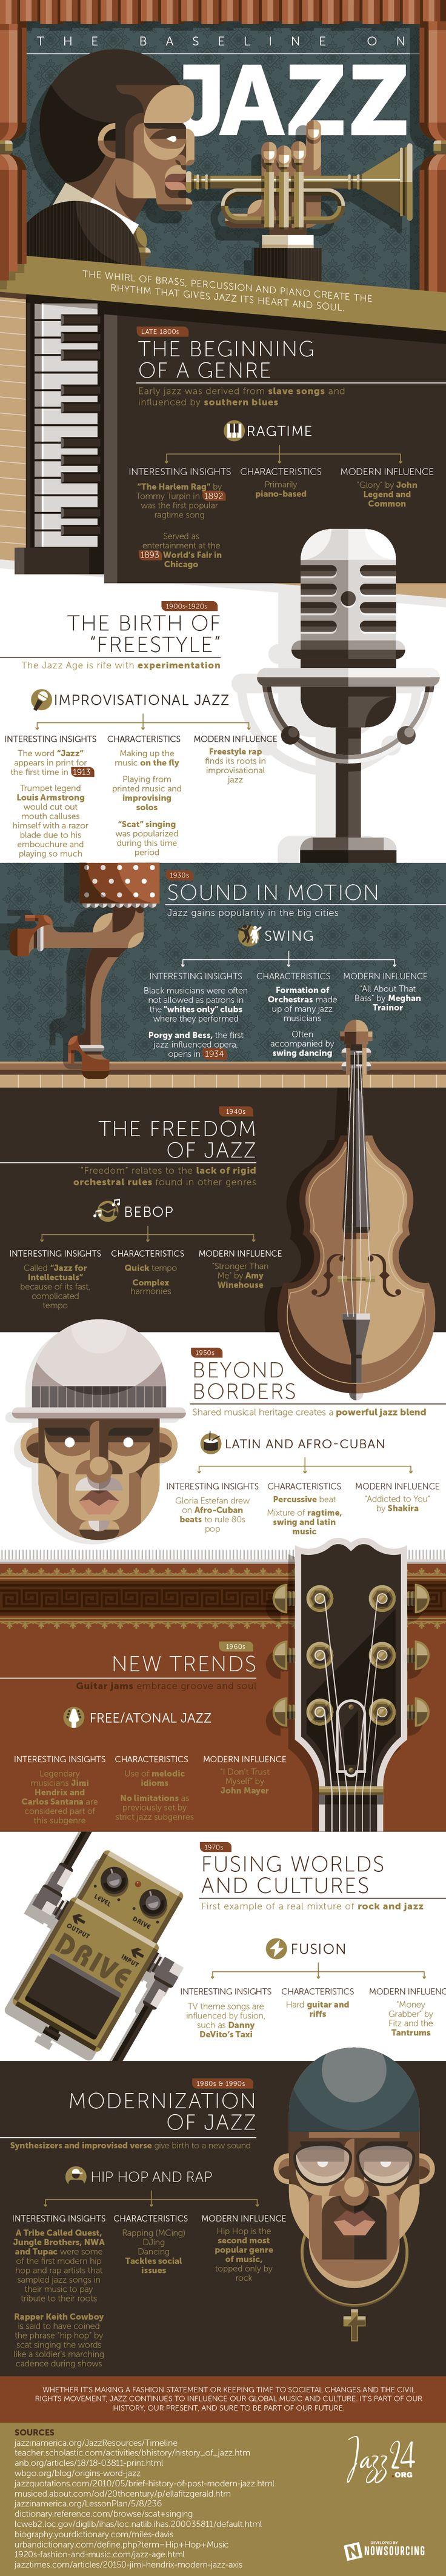 The Baseline on Jazz #infographic #Music #Jazz